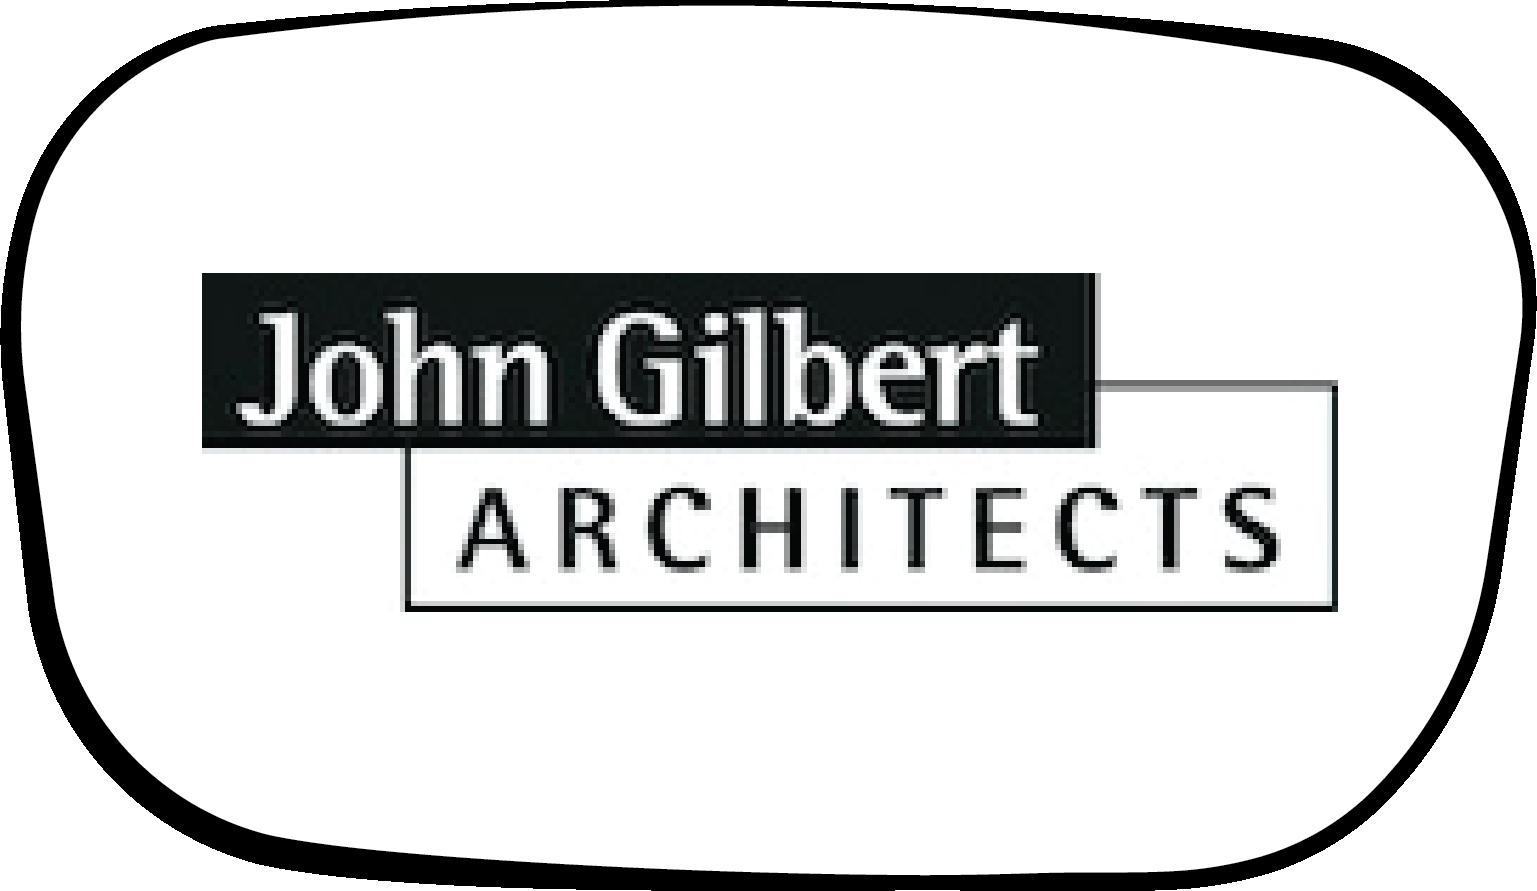 John Gilbert Architects